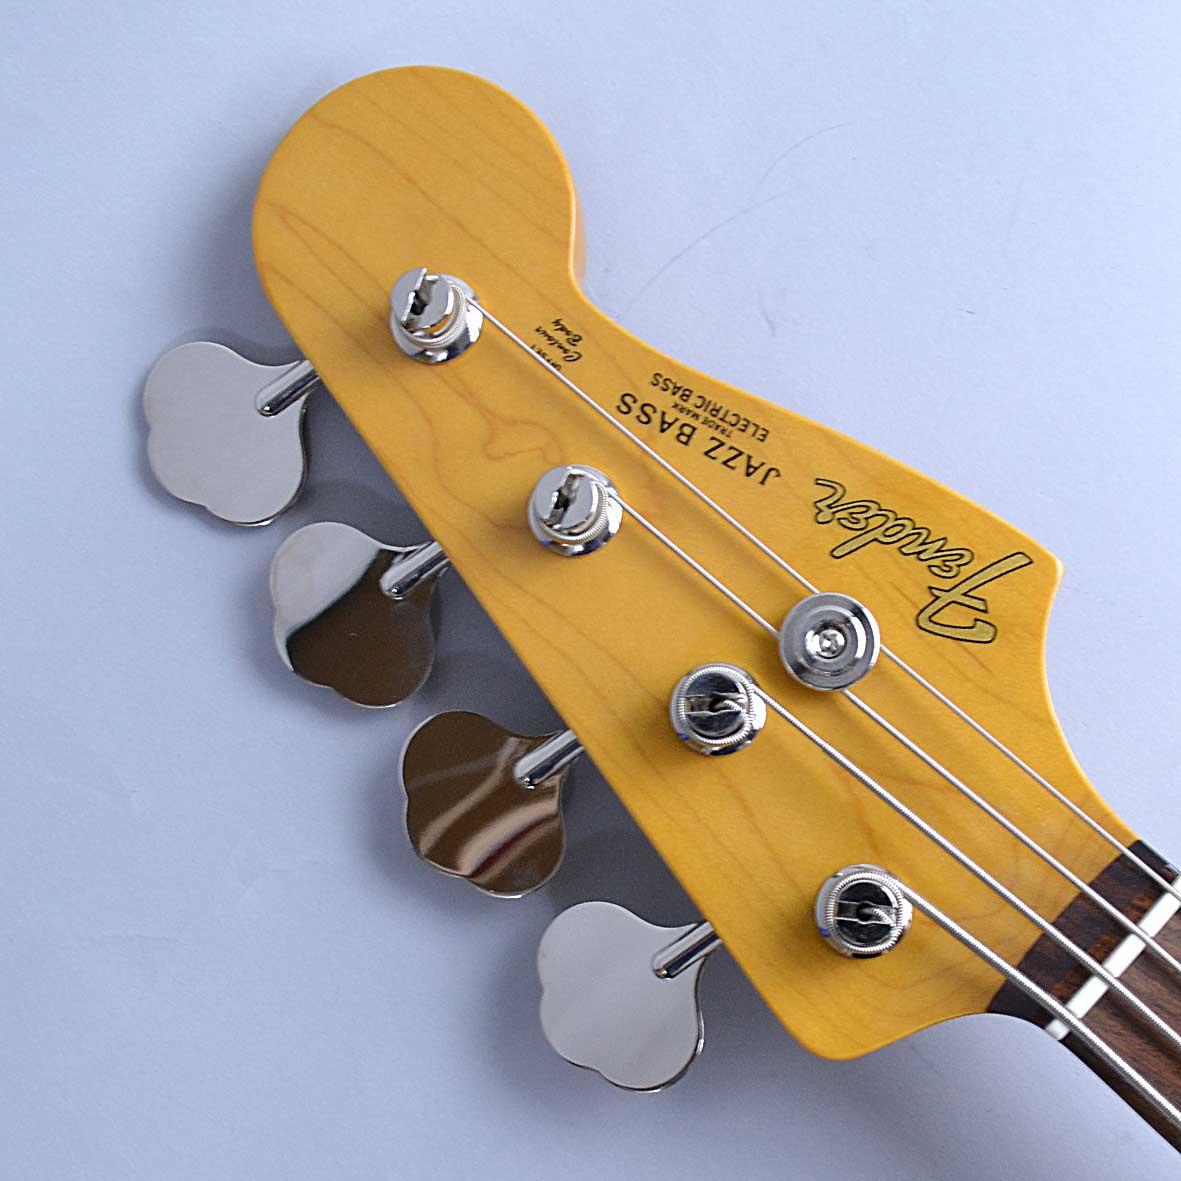 Fender TRAD 60S JASS BASSのヘッド画像